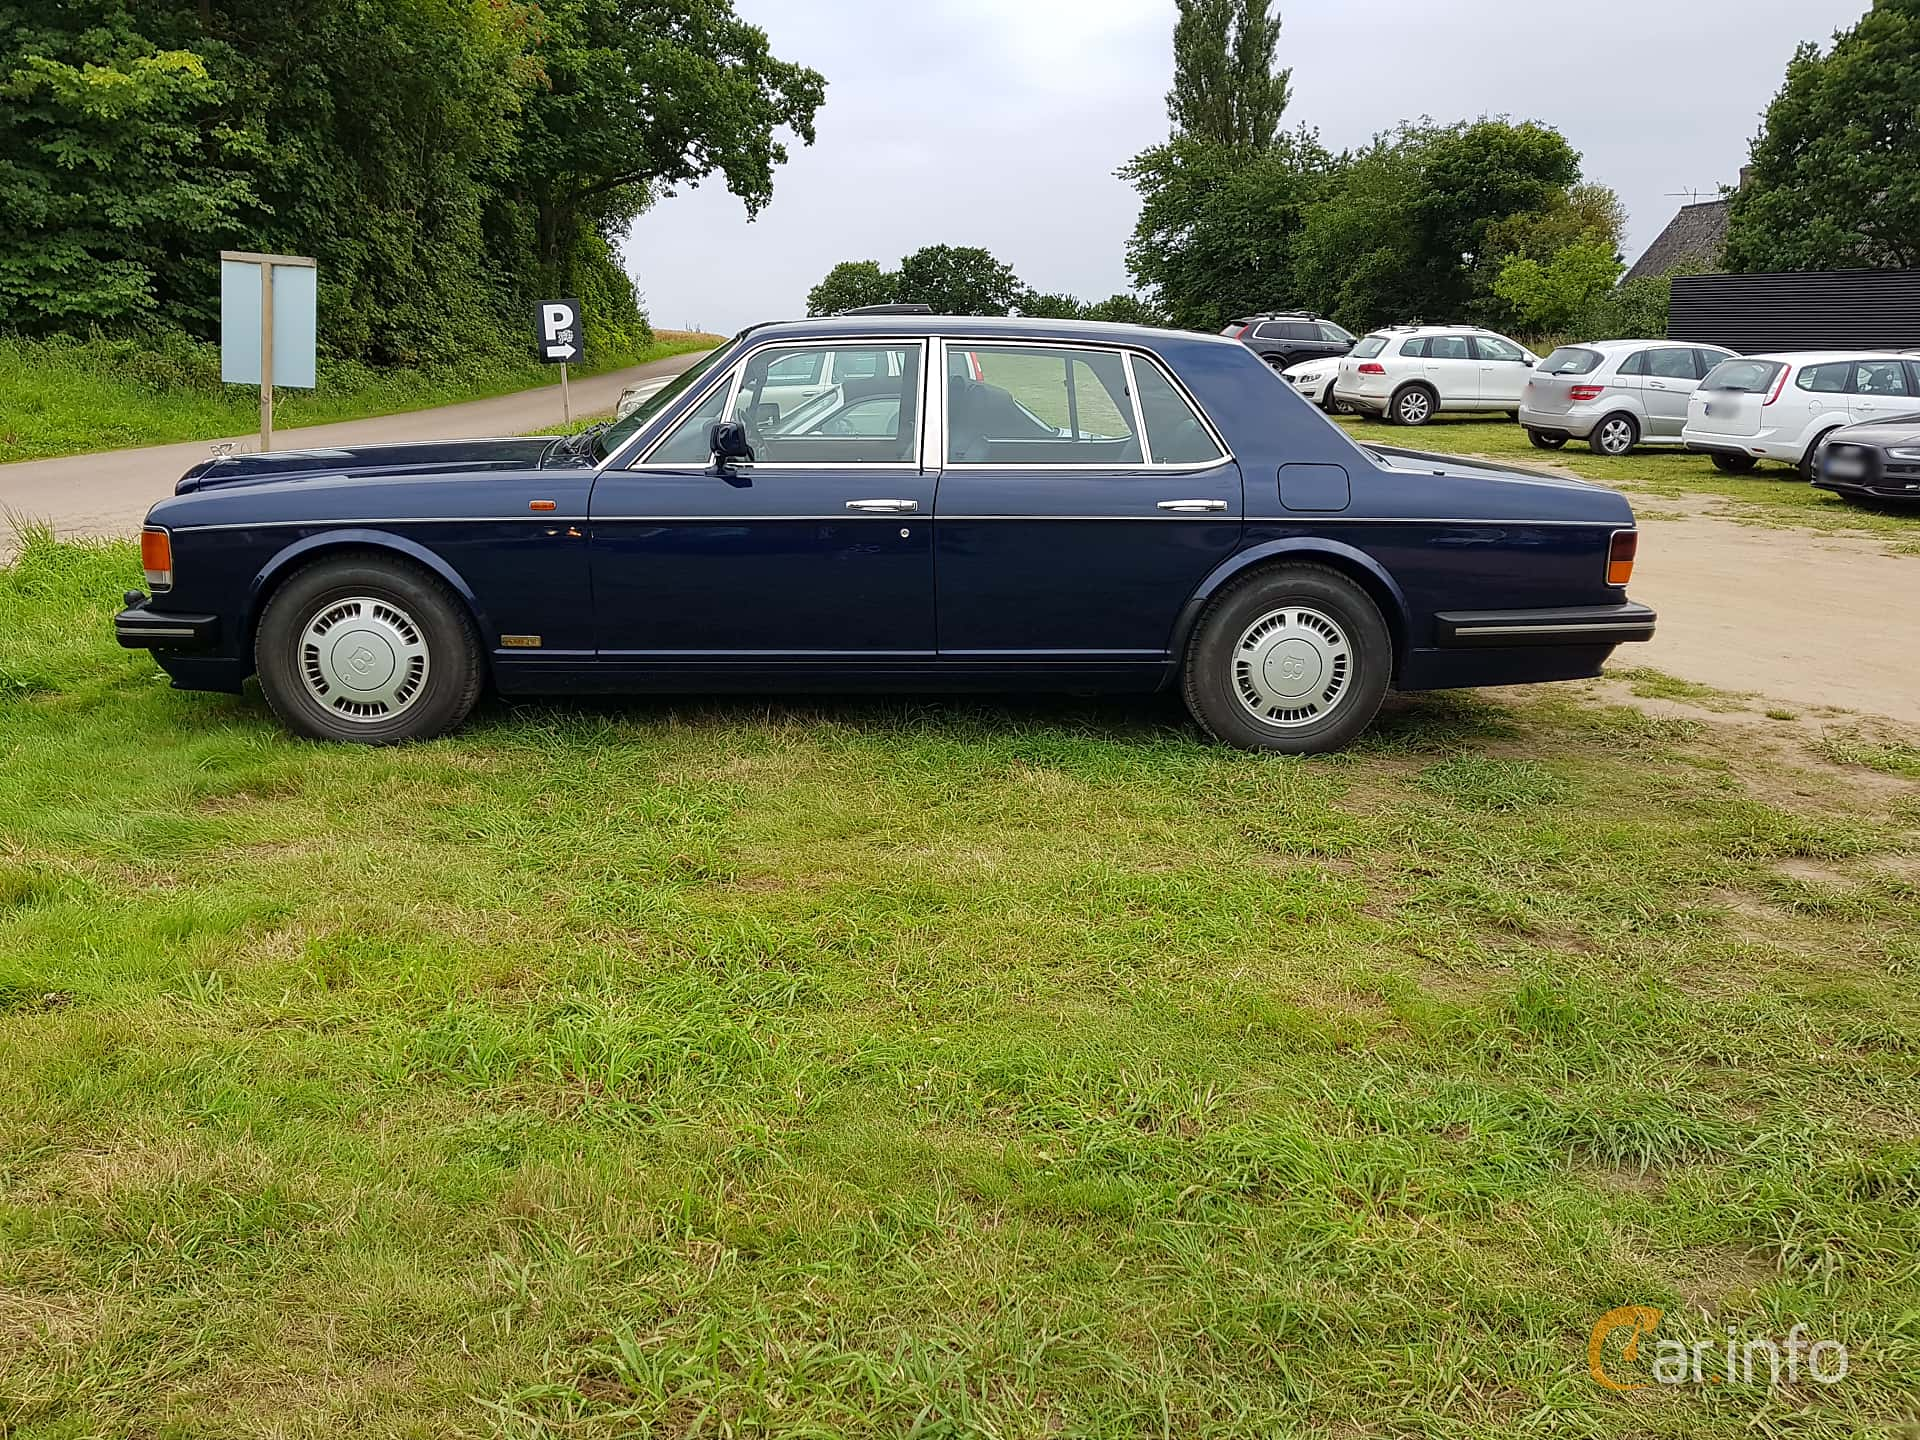 Bentley Turbo R 6.75 V8 Automatic, 313hp, 1990